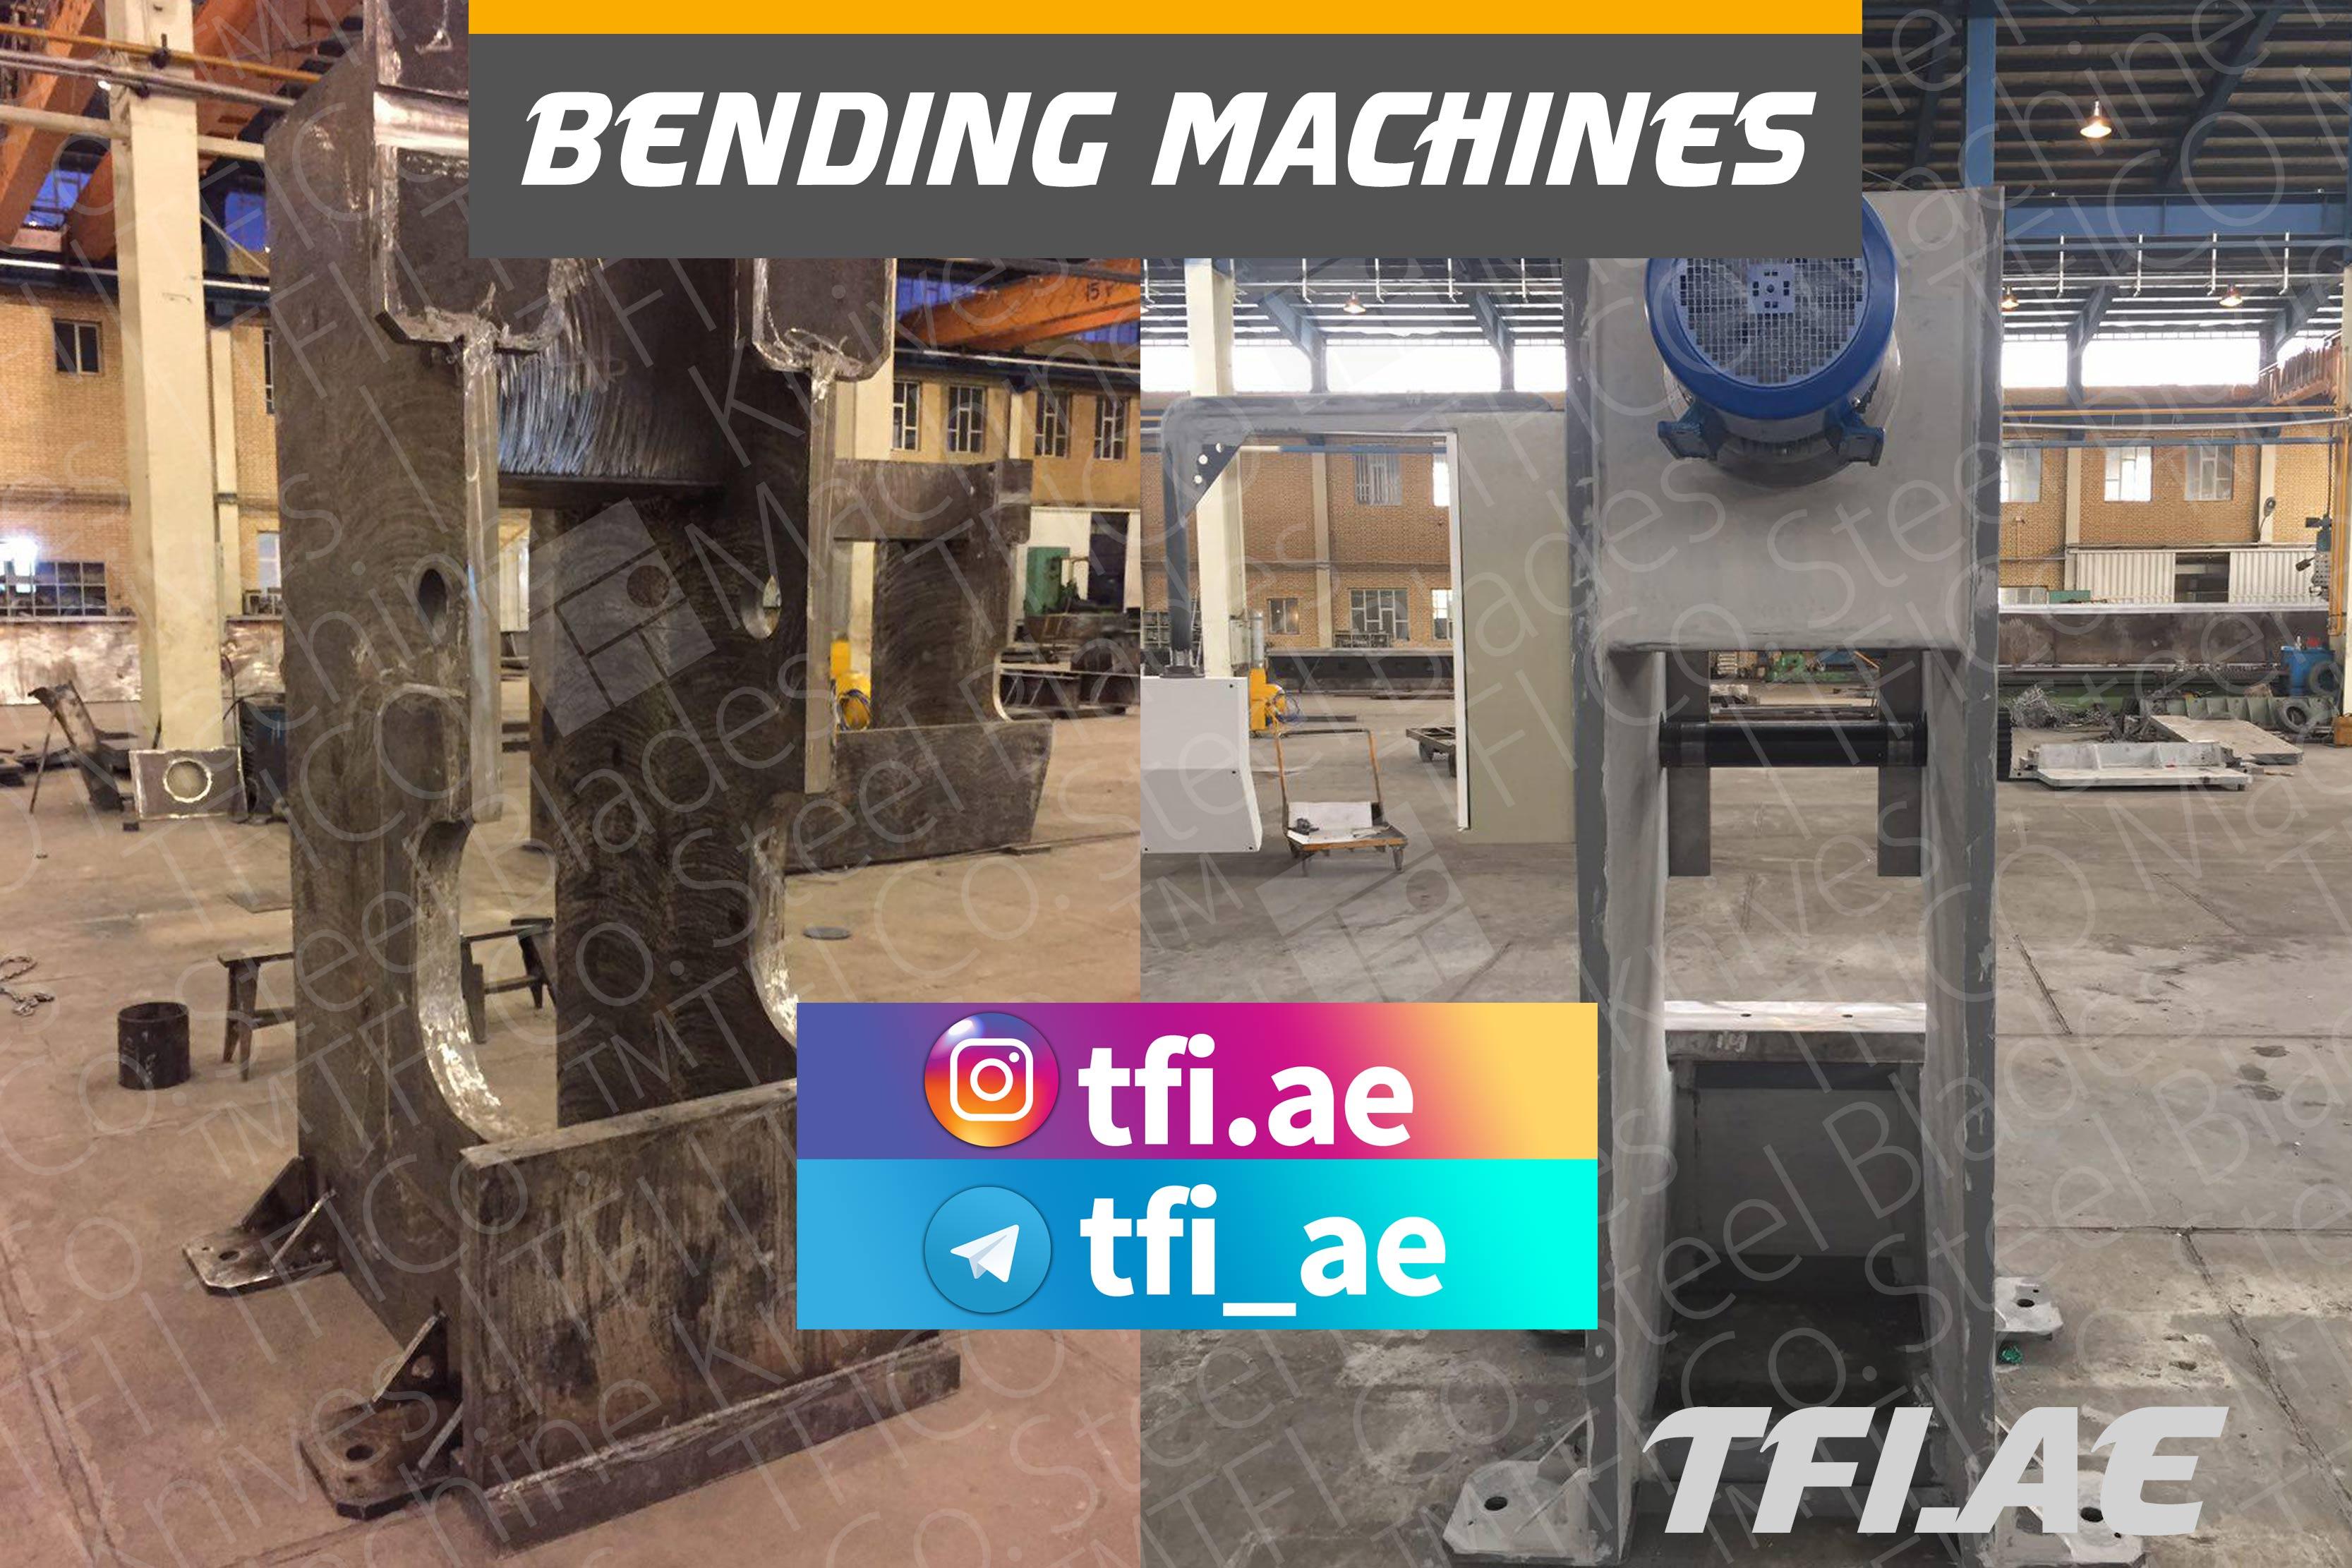 bending machine, press brake, customized, uae, dubai, qatar, saudi, jeddah, muscat, oman, kuwait, press brake,